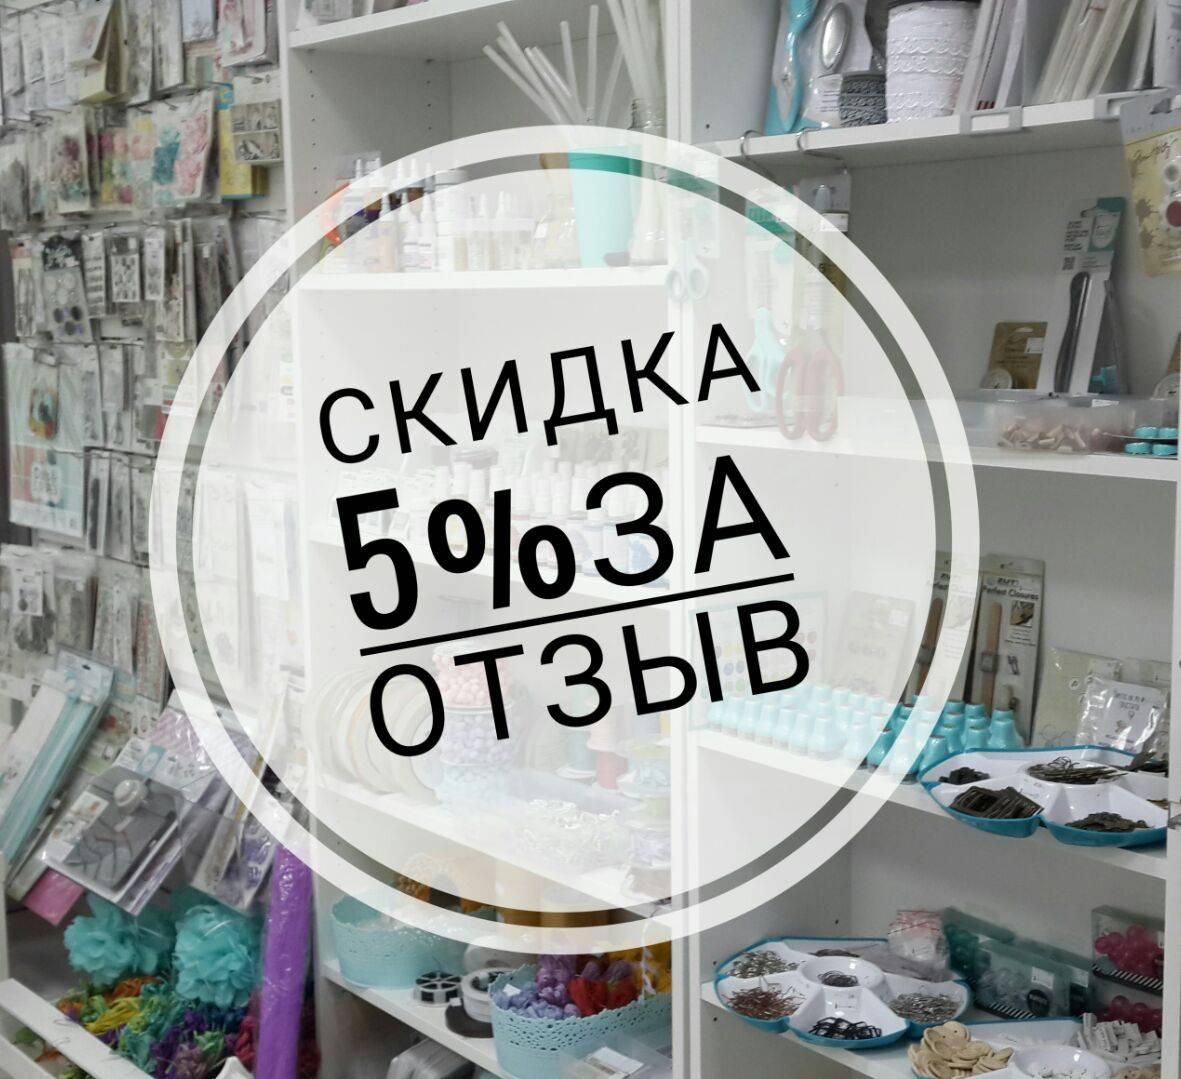 Как я учитываю инвестиции в intelinvest.ru